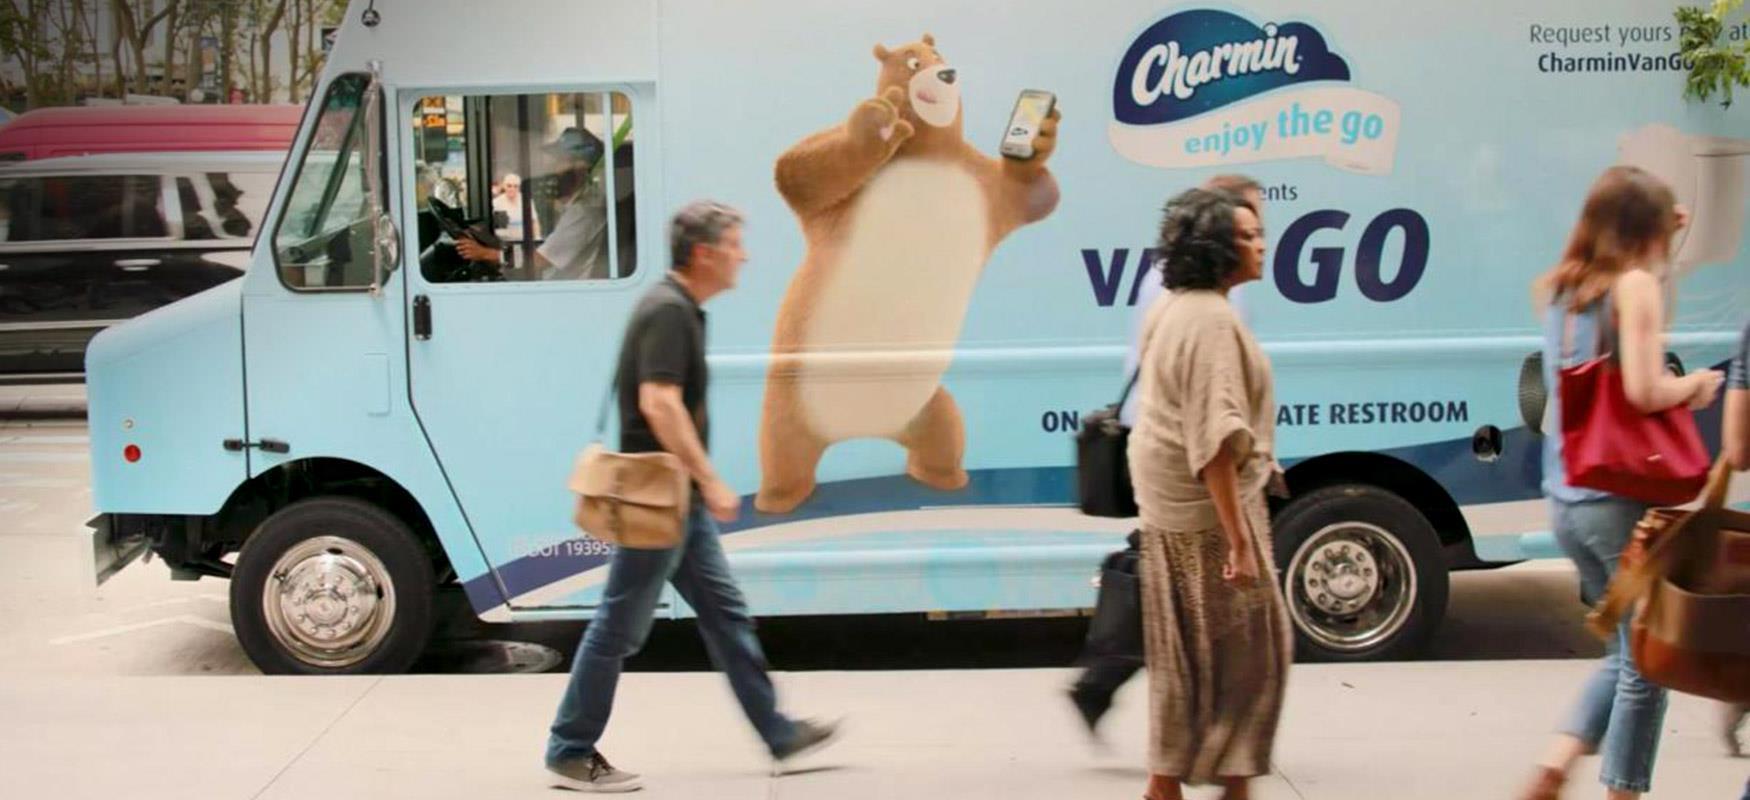 Charmin Van-Go: Helping New Yorkers go on-the-go